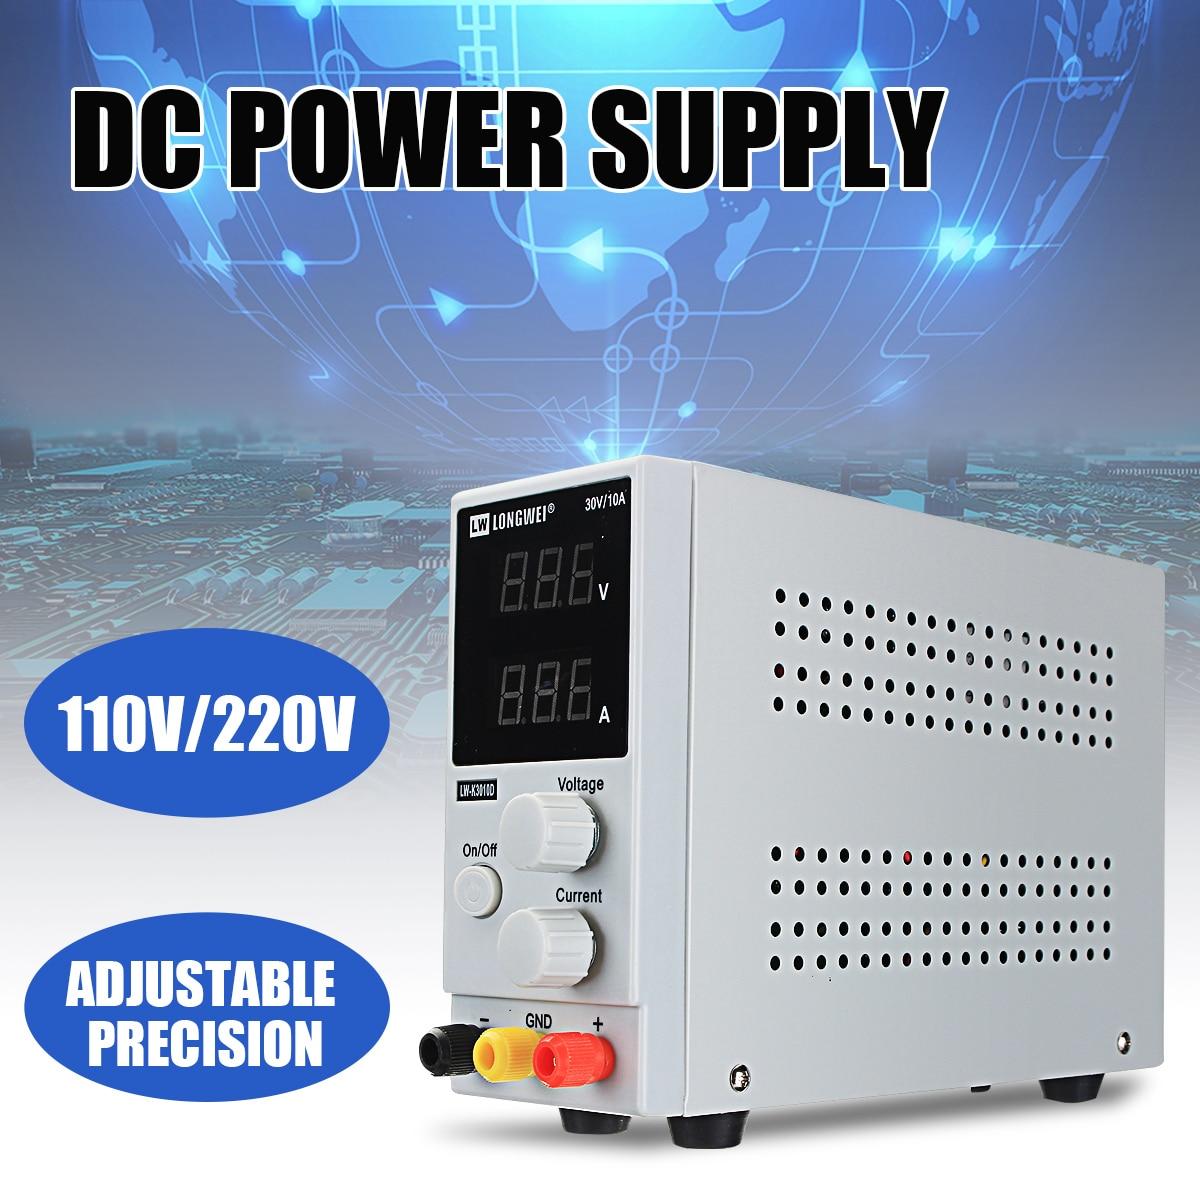 220 V 0-30 V 0-10A LCD DC Regolatore di Tensione di Alimentazione Variabile di Commutazione Regolabile alimentazione Regolata di Alimentazione Digitale laboratorio